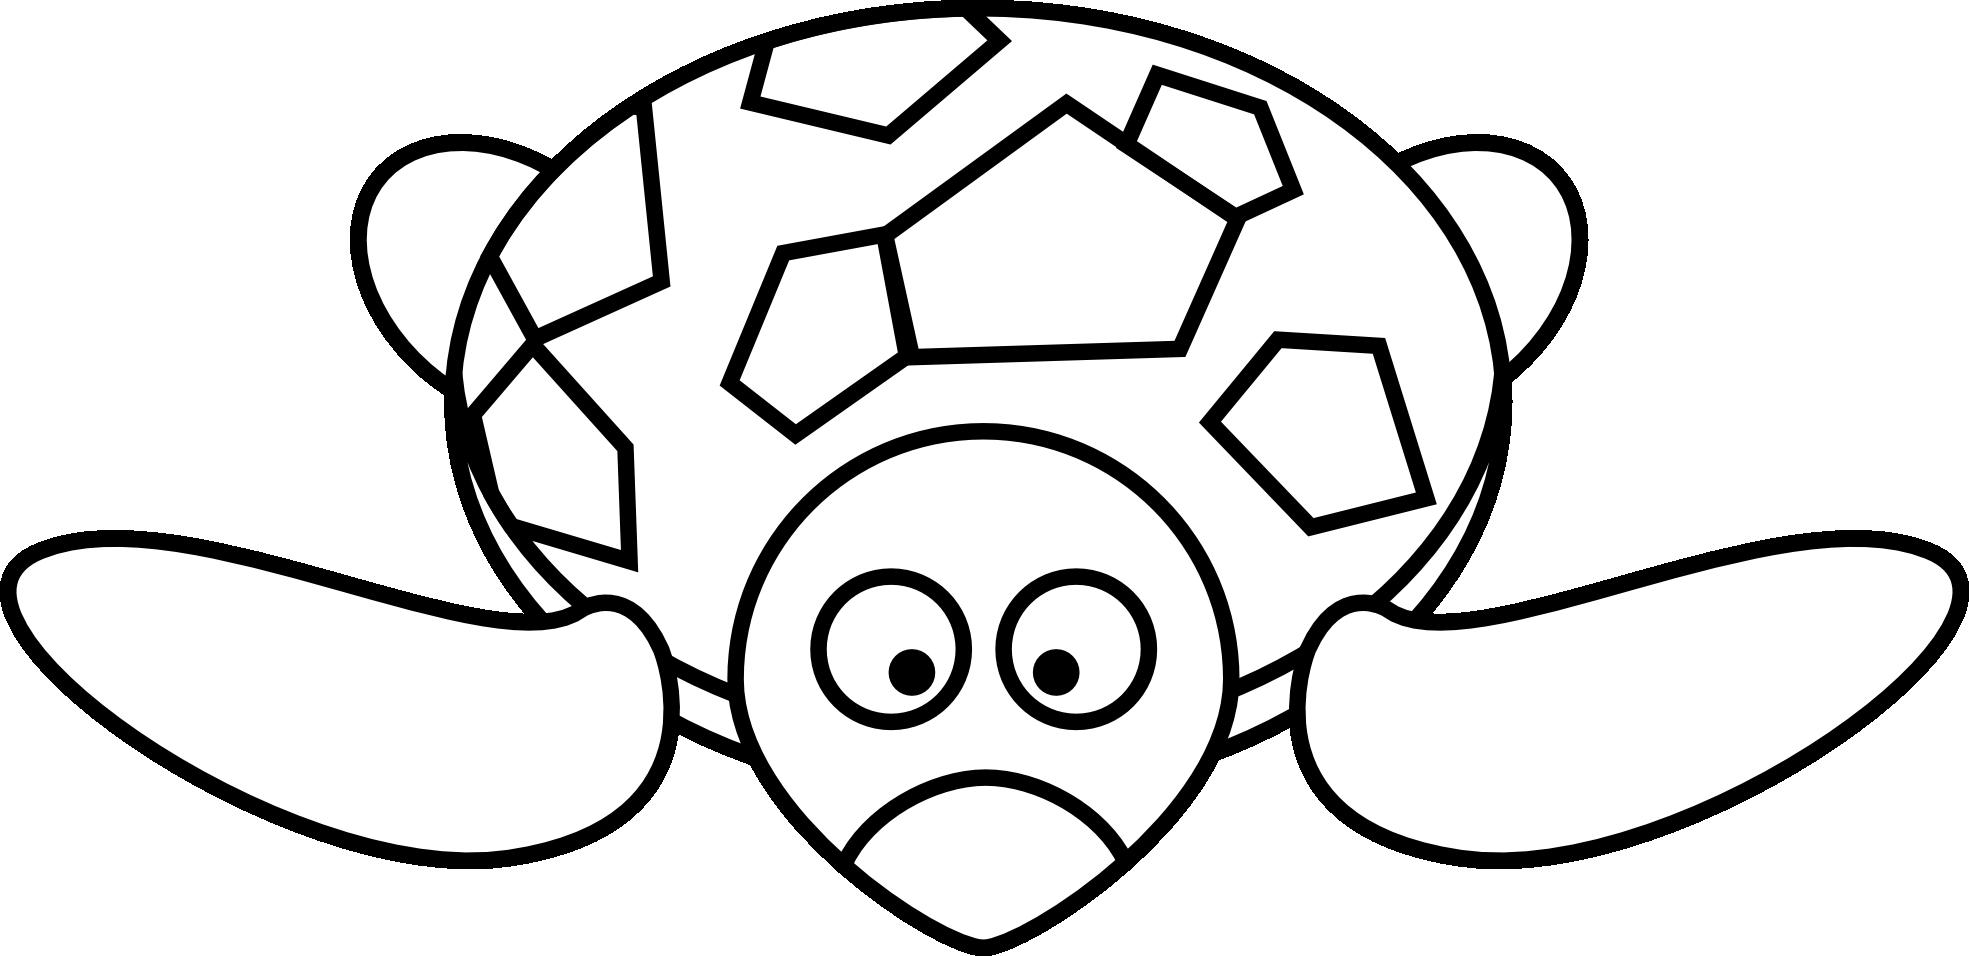 1934577 further Satz Heiligenbilder Maschine Werkzeug 32219162 additionally 172809662141 additionally Farm To Table Annual Fundraising Dinner in addition Turtle Cartoon Pictures. on art farm